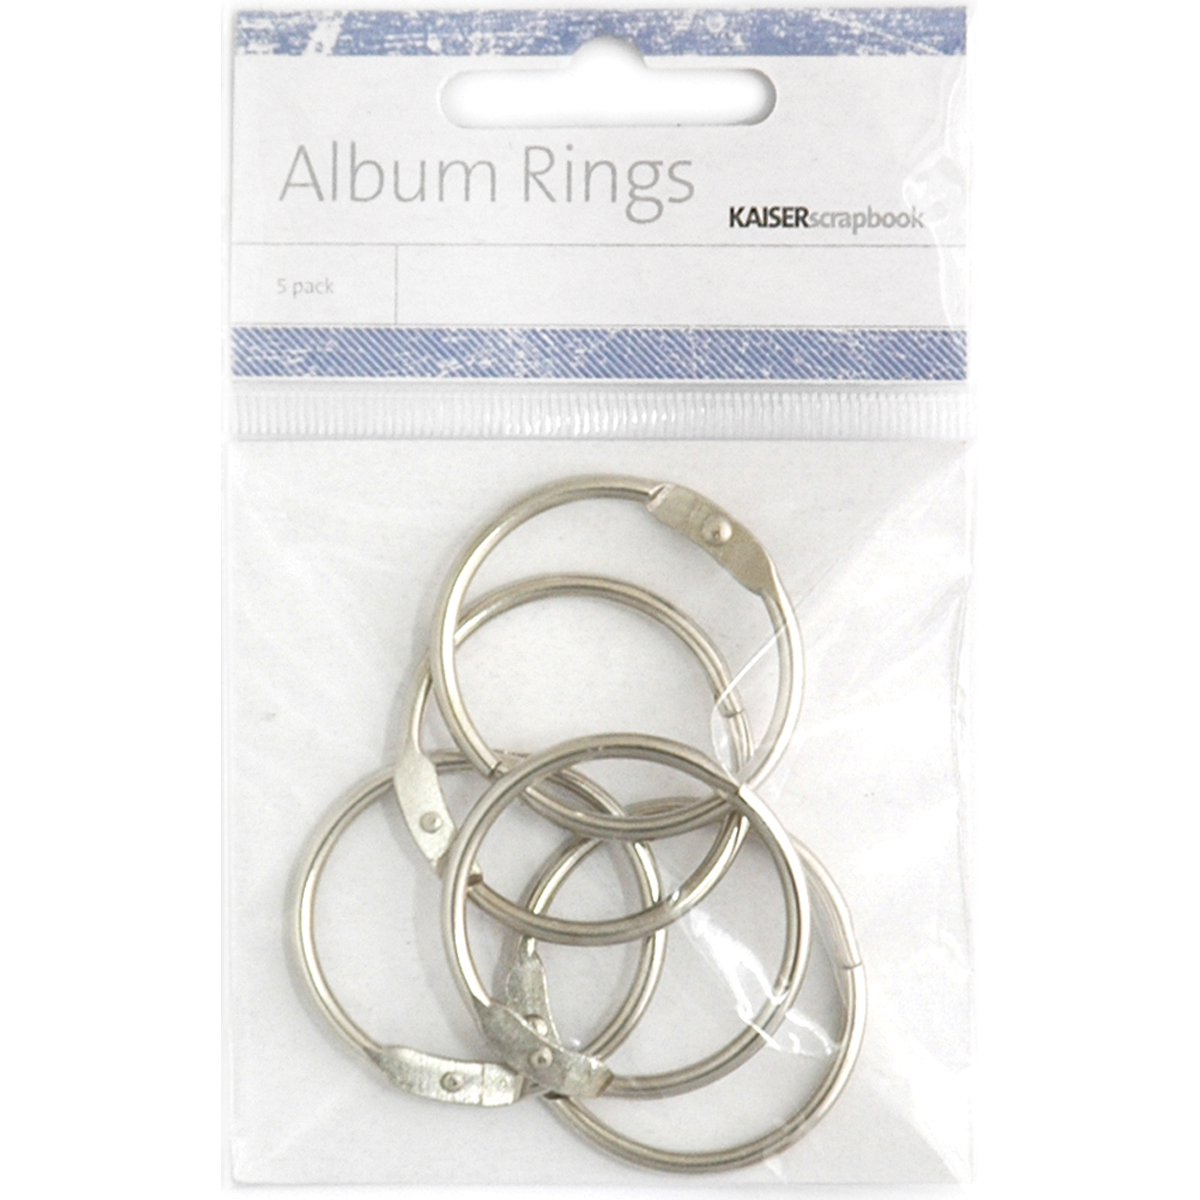 Kaisercraft 3.5cm Rings